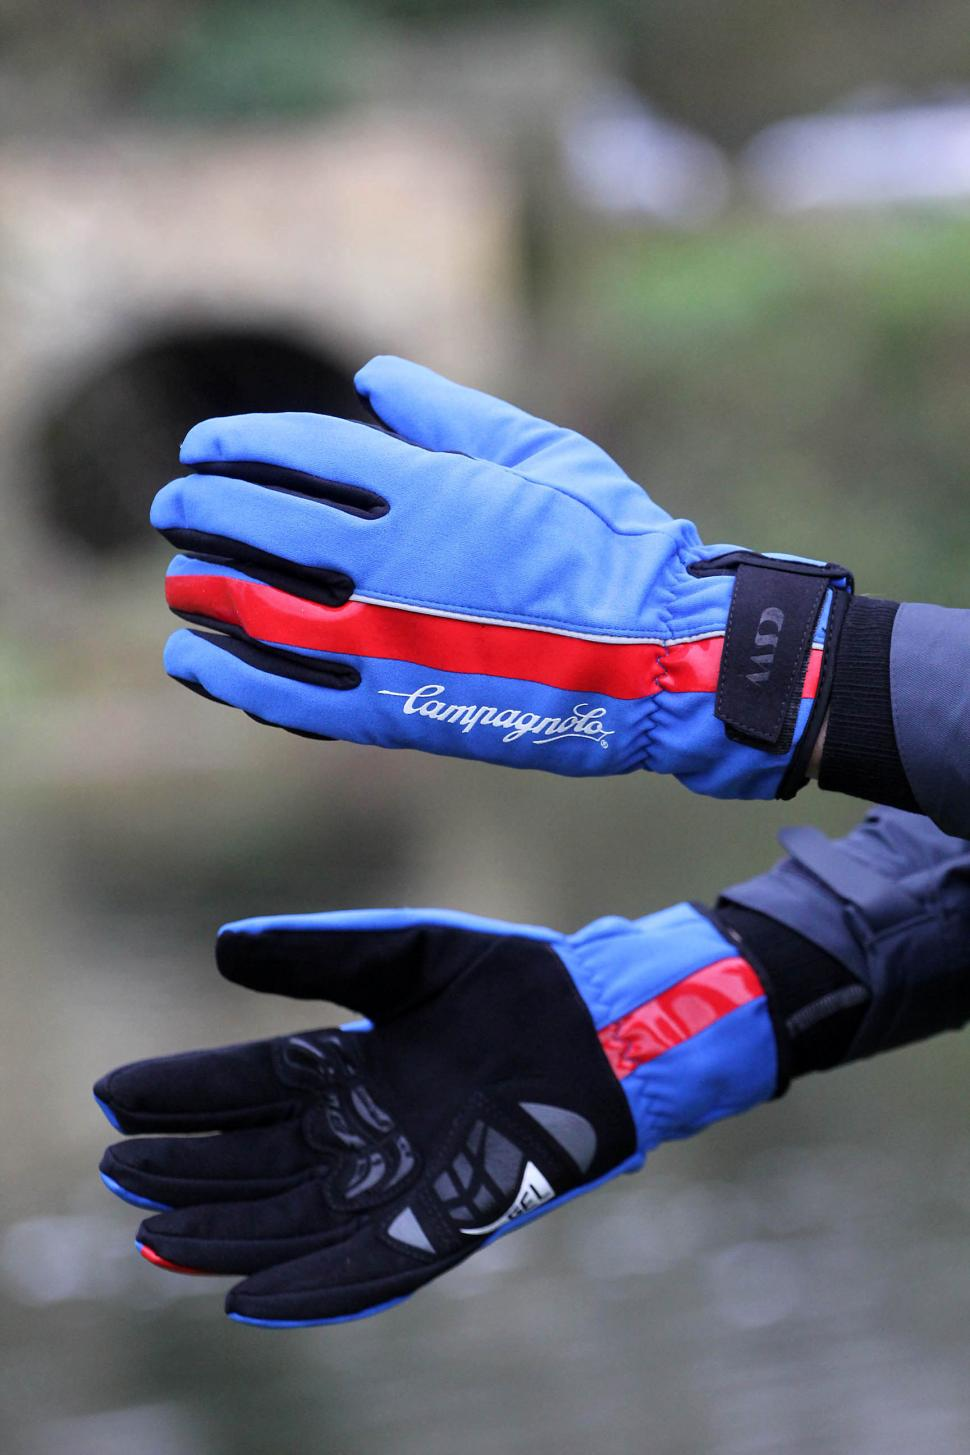 Campagnolo Waterproof Gloves